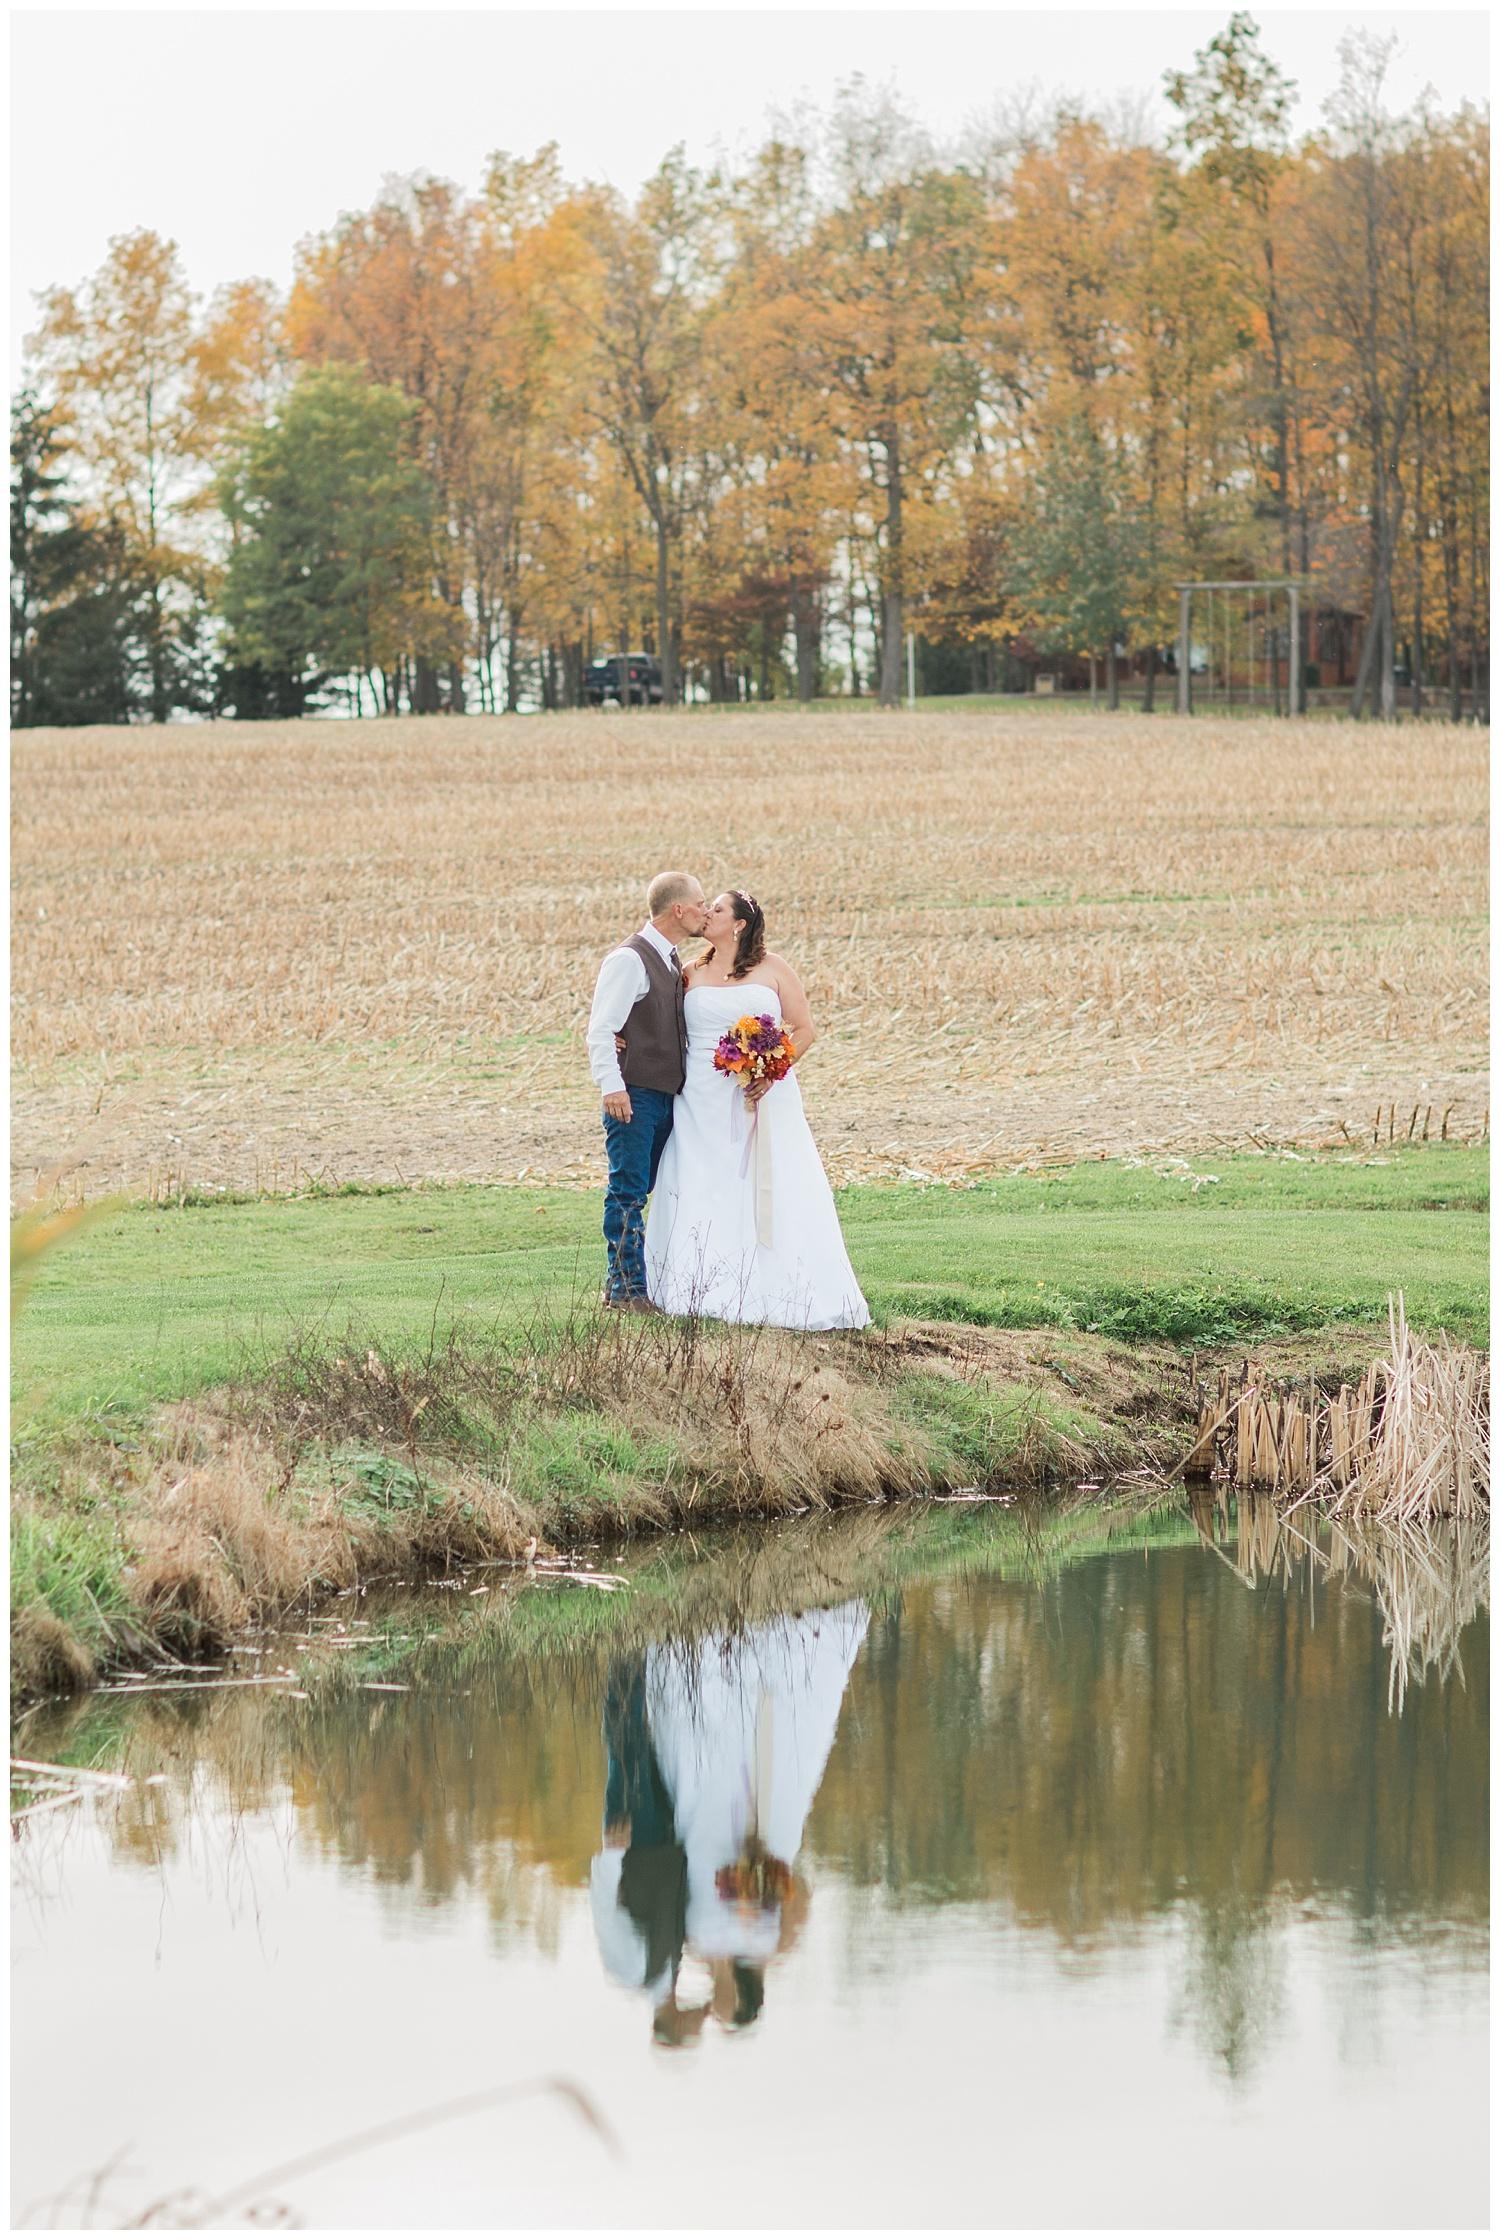 The Hall Wedding - York NY - Lass and Beau-761_Buffalo wedding photography.jpg